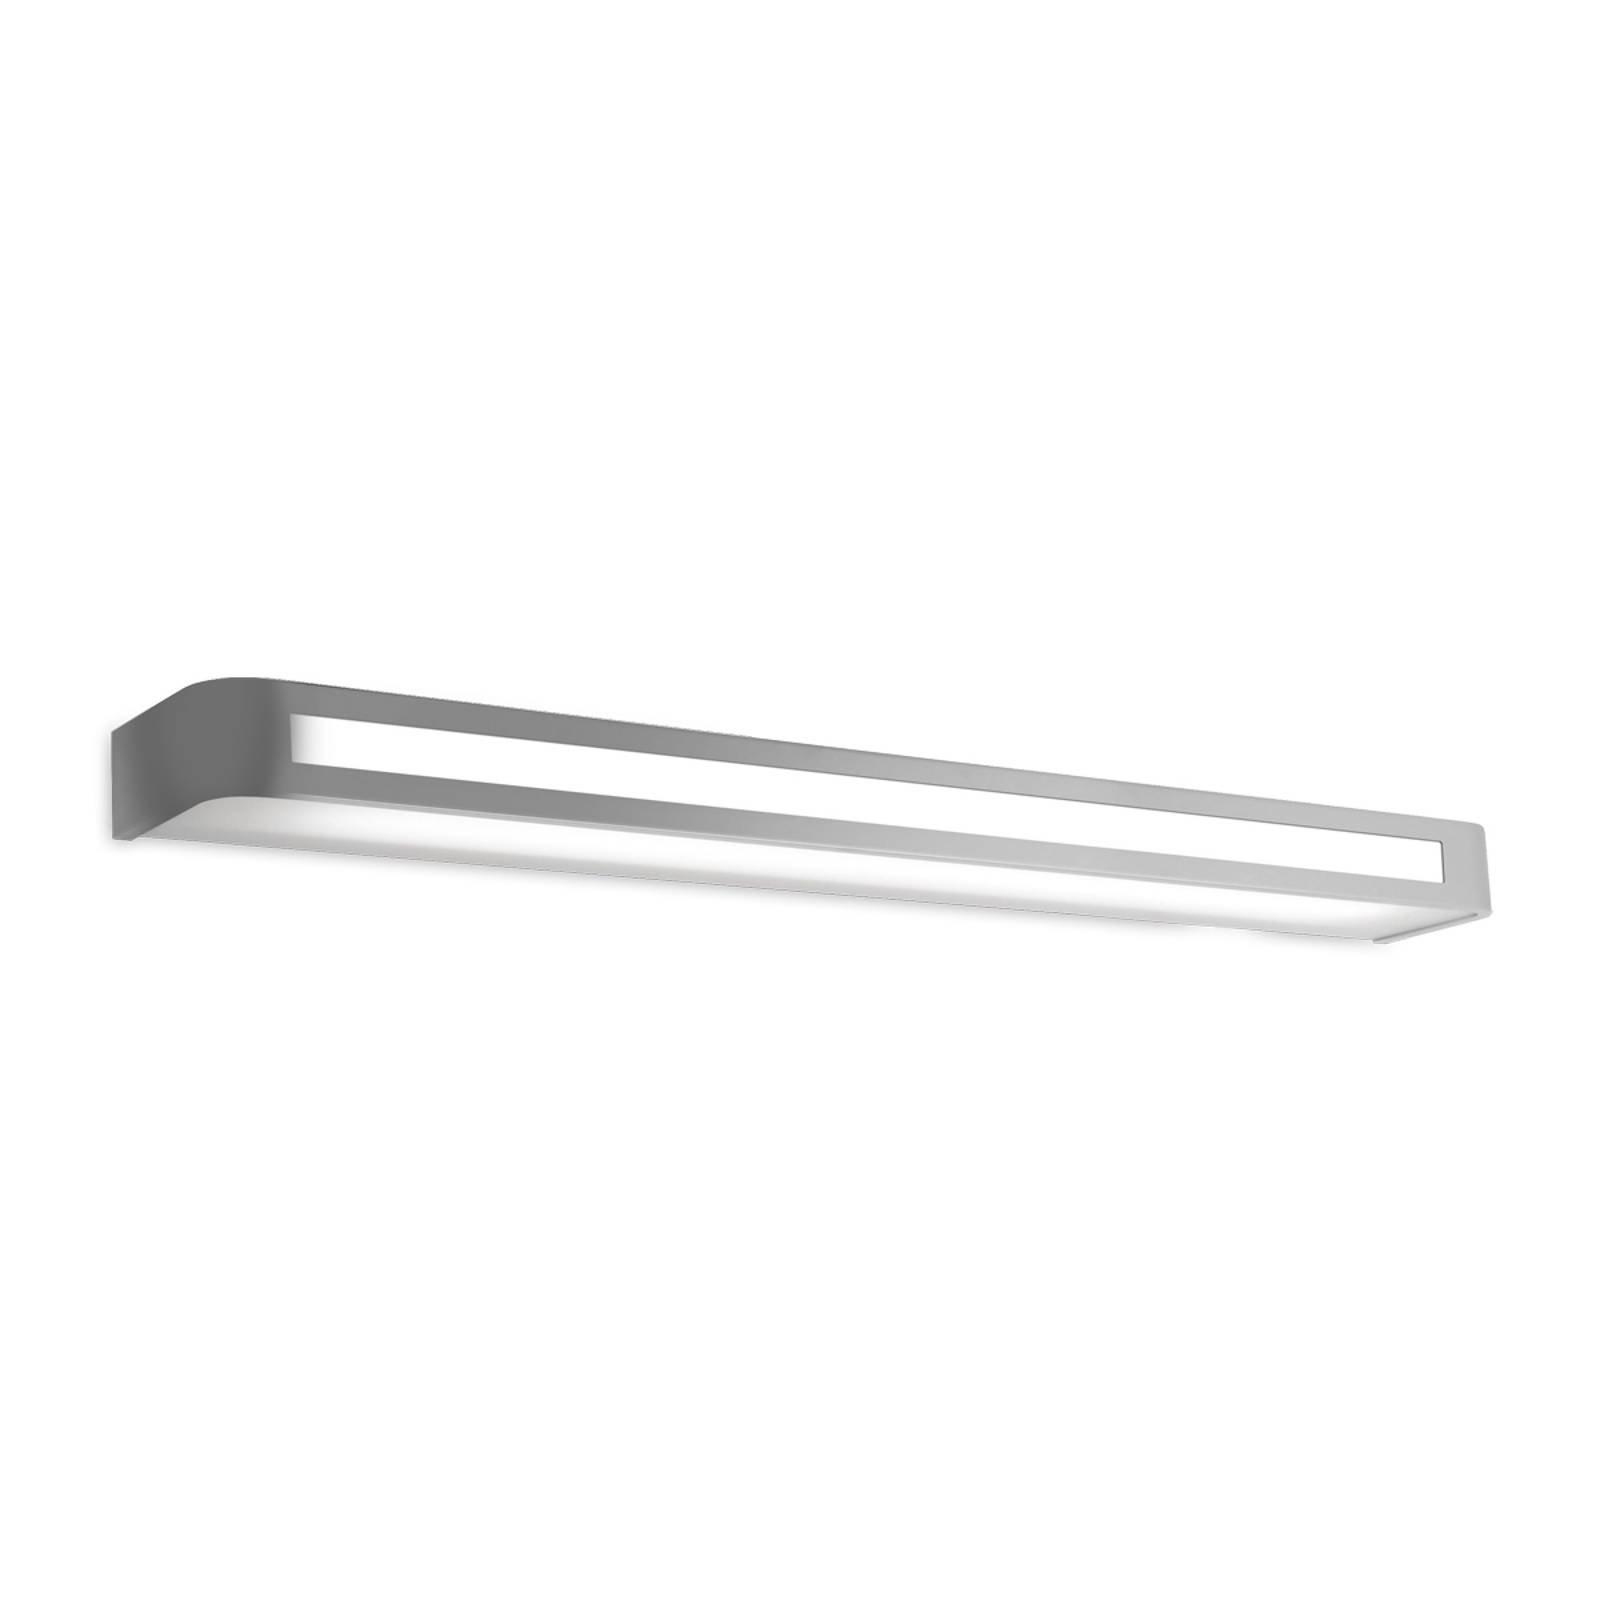 Tidløs LED-vegglampe Arcos, IP20 90 cm, krom